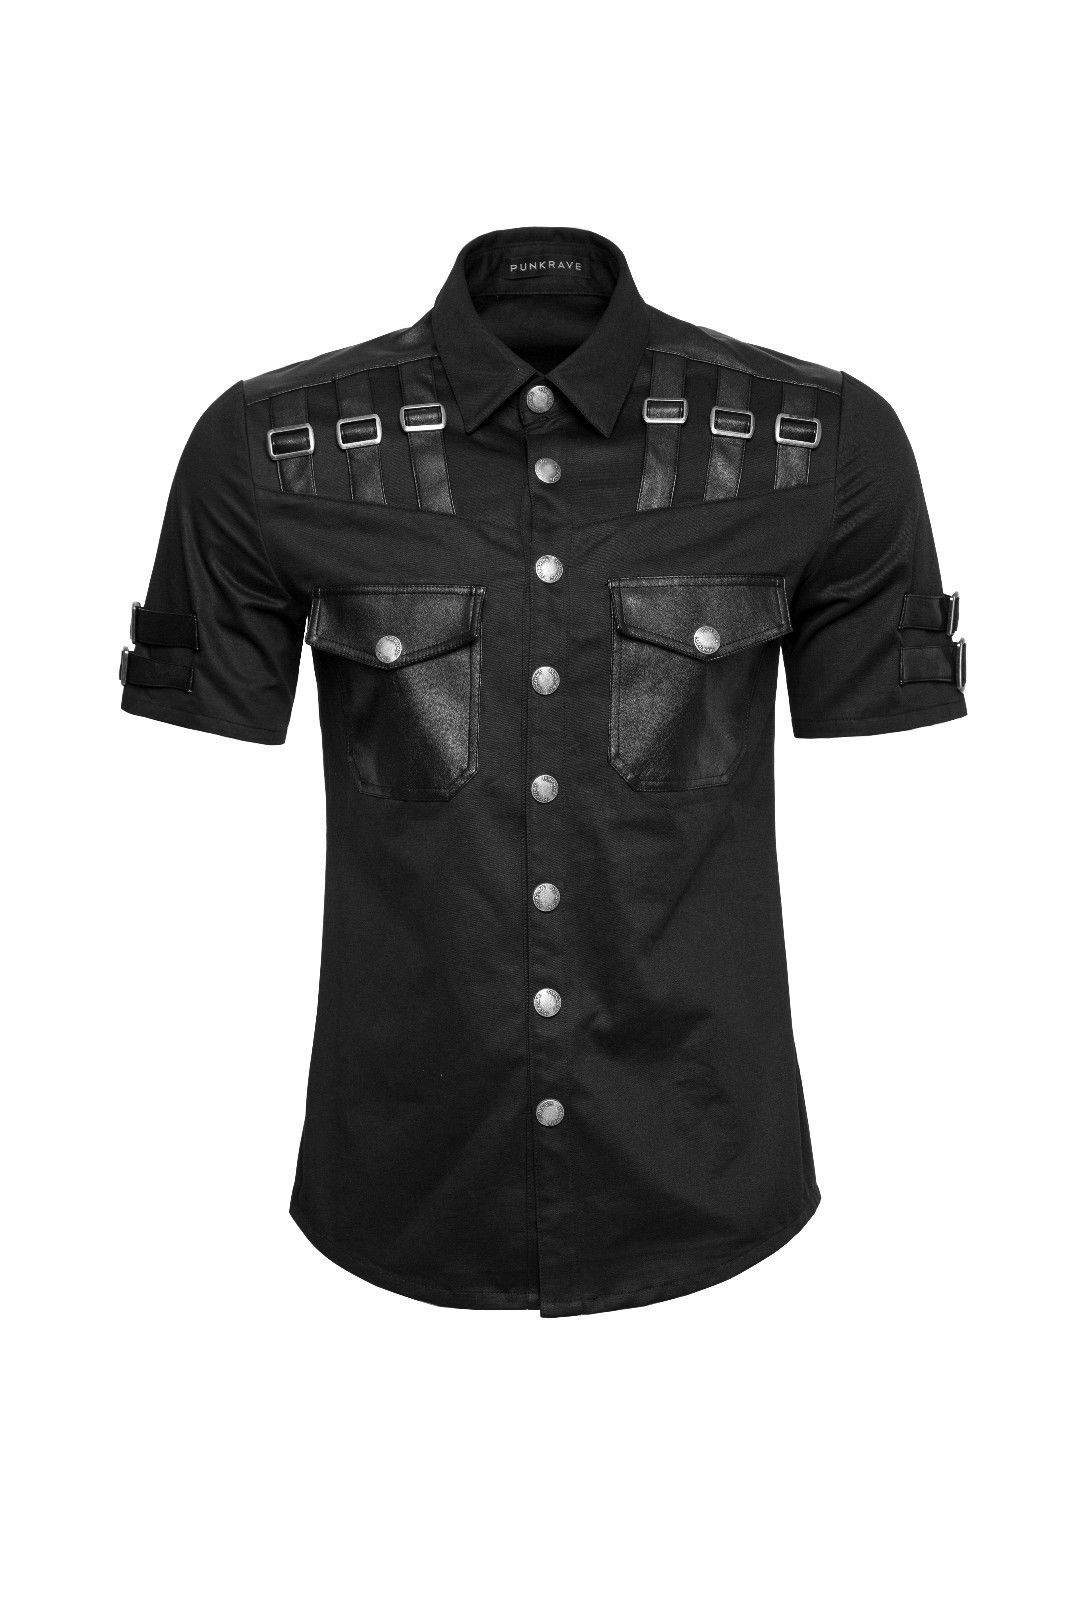 Mens Gothic Summer Shirt Military Style Short Punk Sleeve Shirt